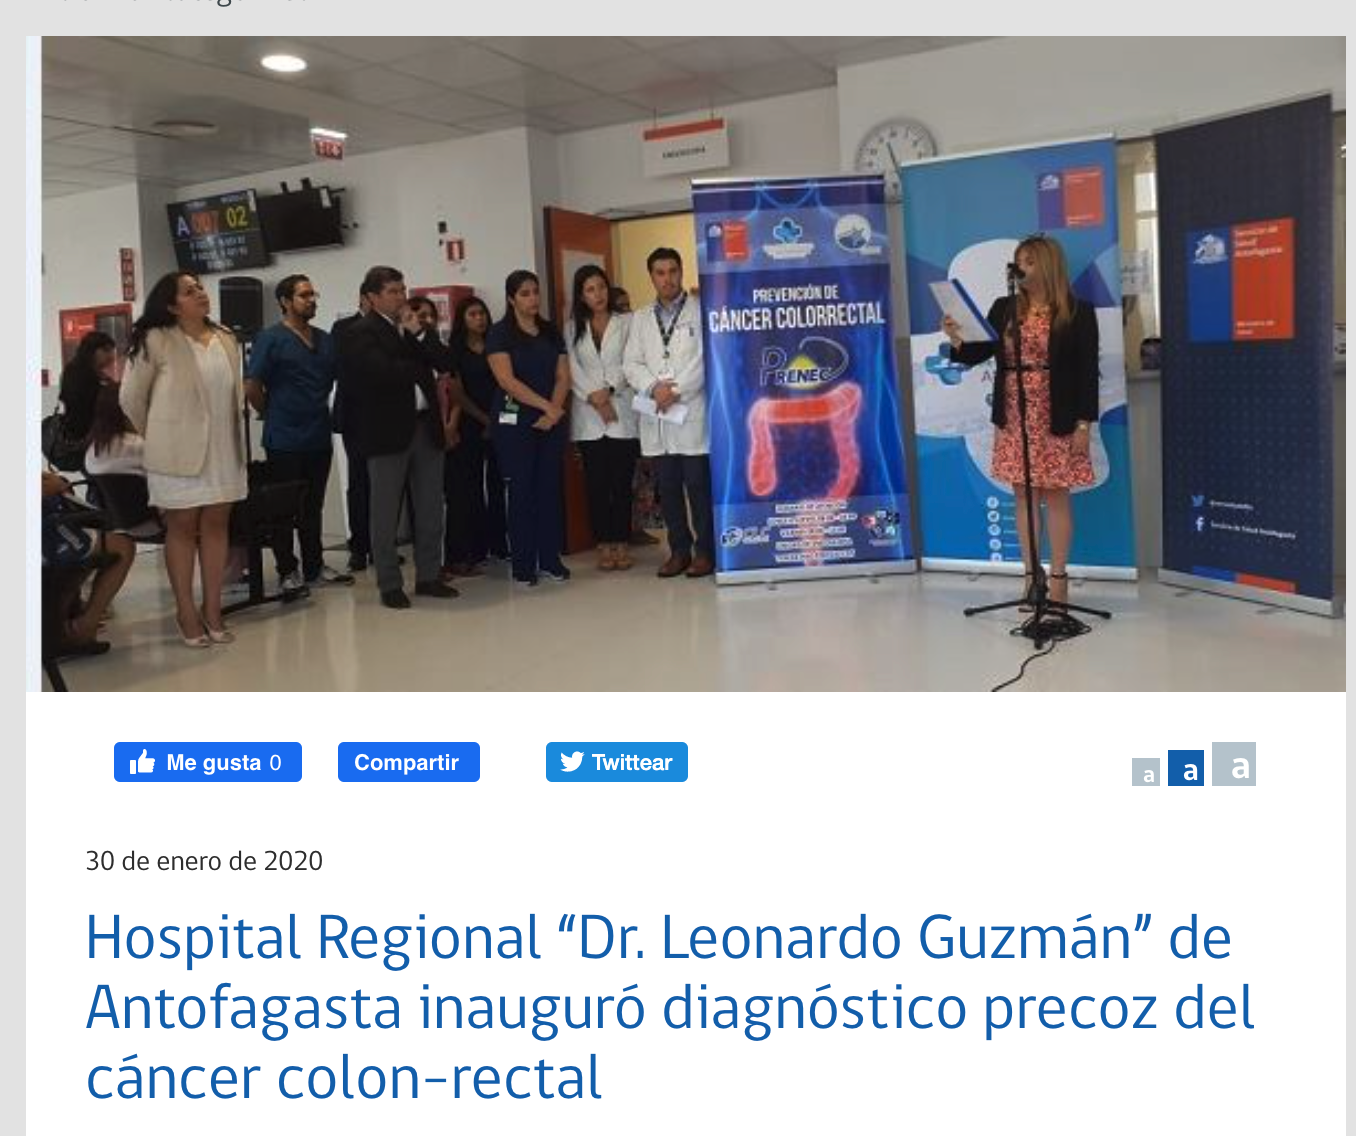 "Hospital Regional ""Dr. Leonardo Guzmán"" de Antofagasta inauguró diagnóstico precoz del cáncer colon-rectal"